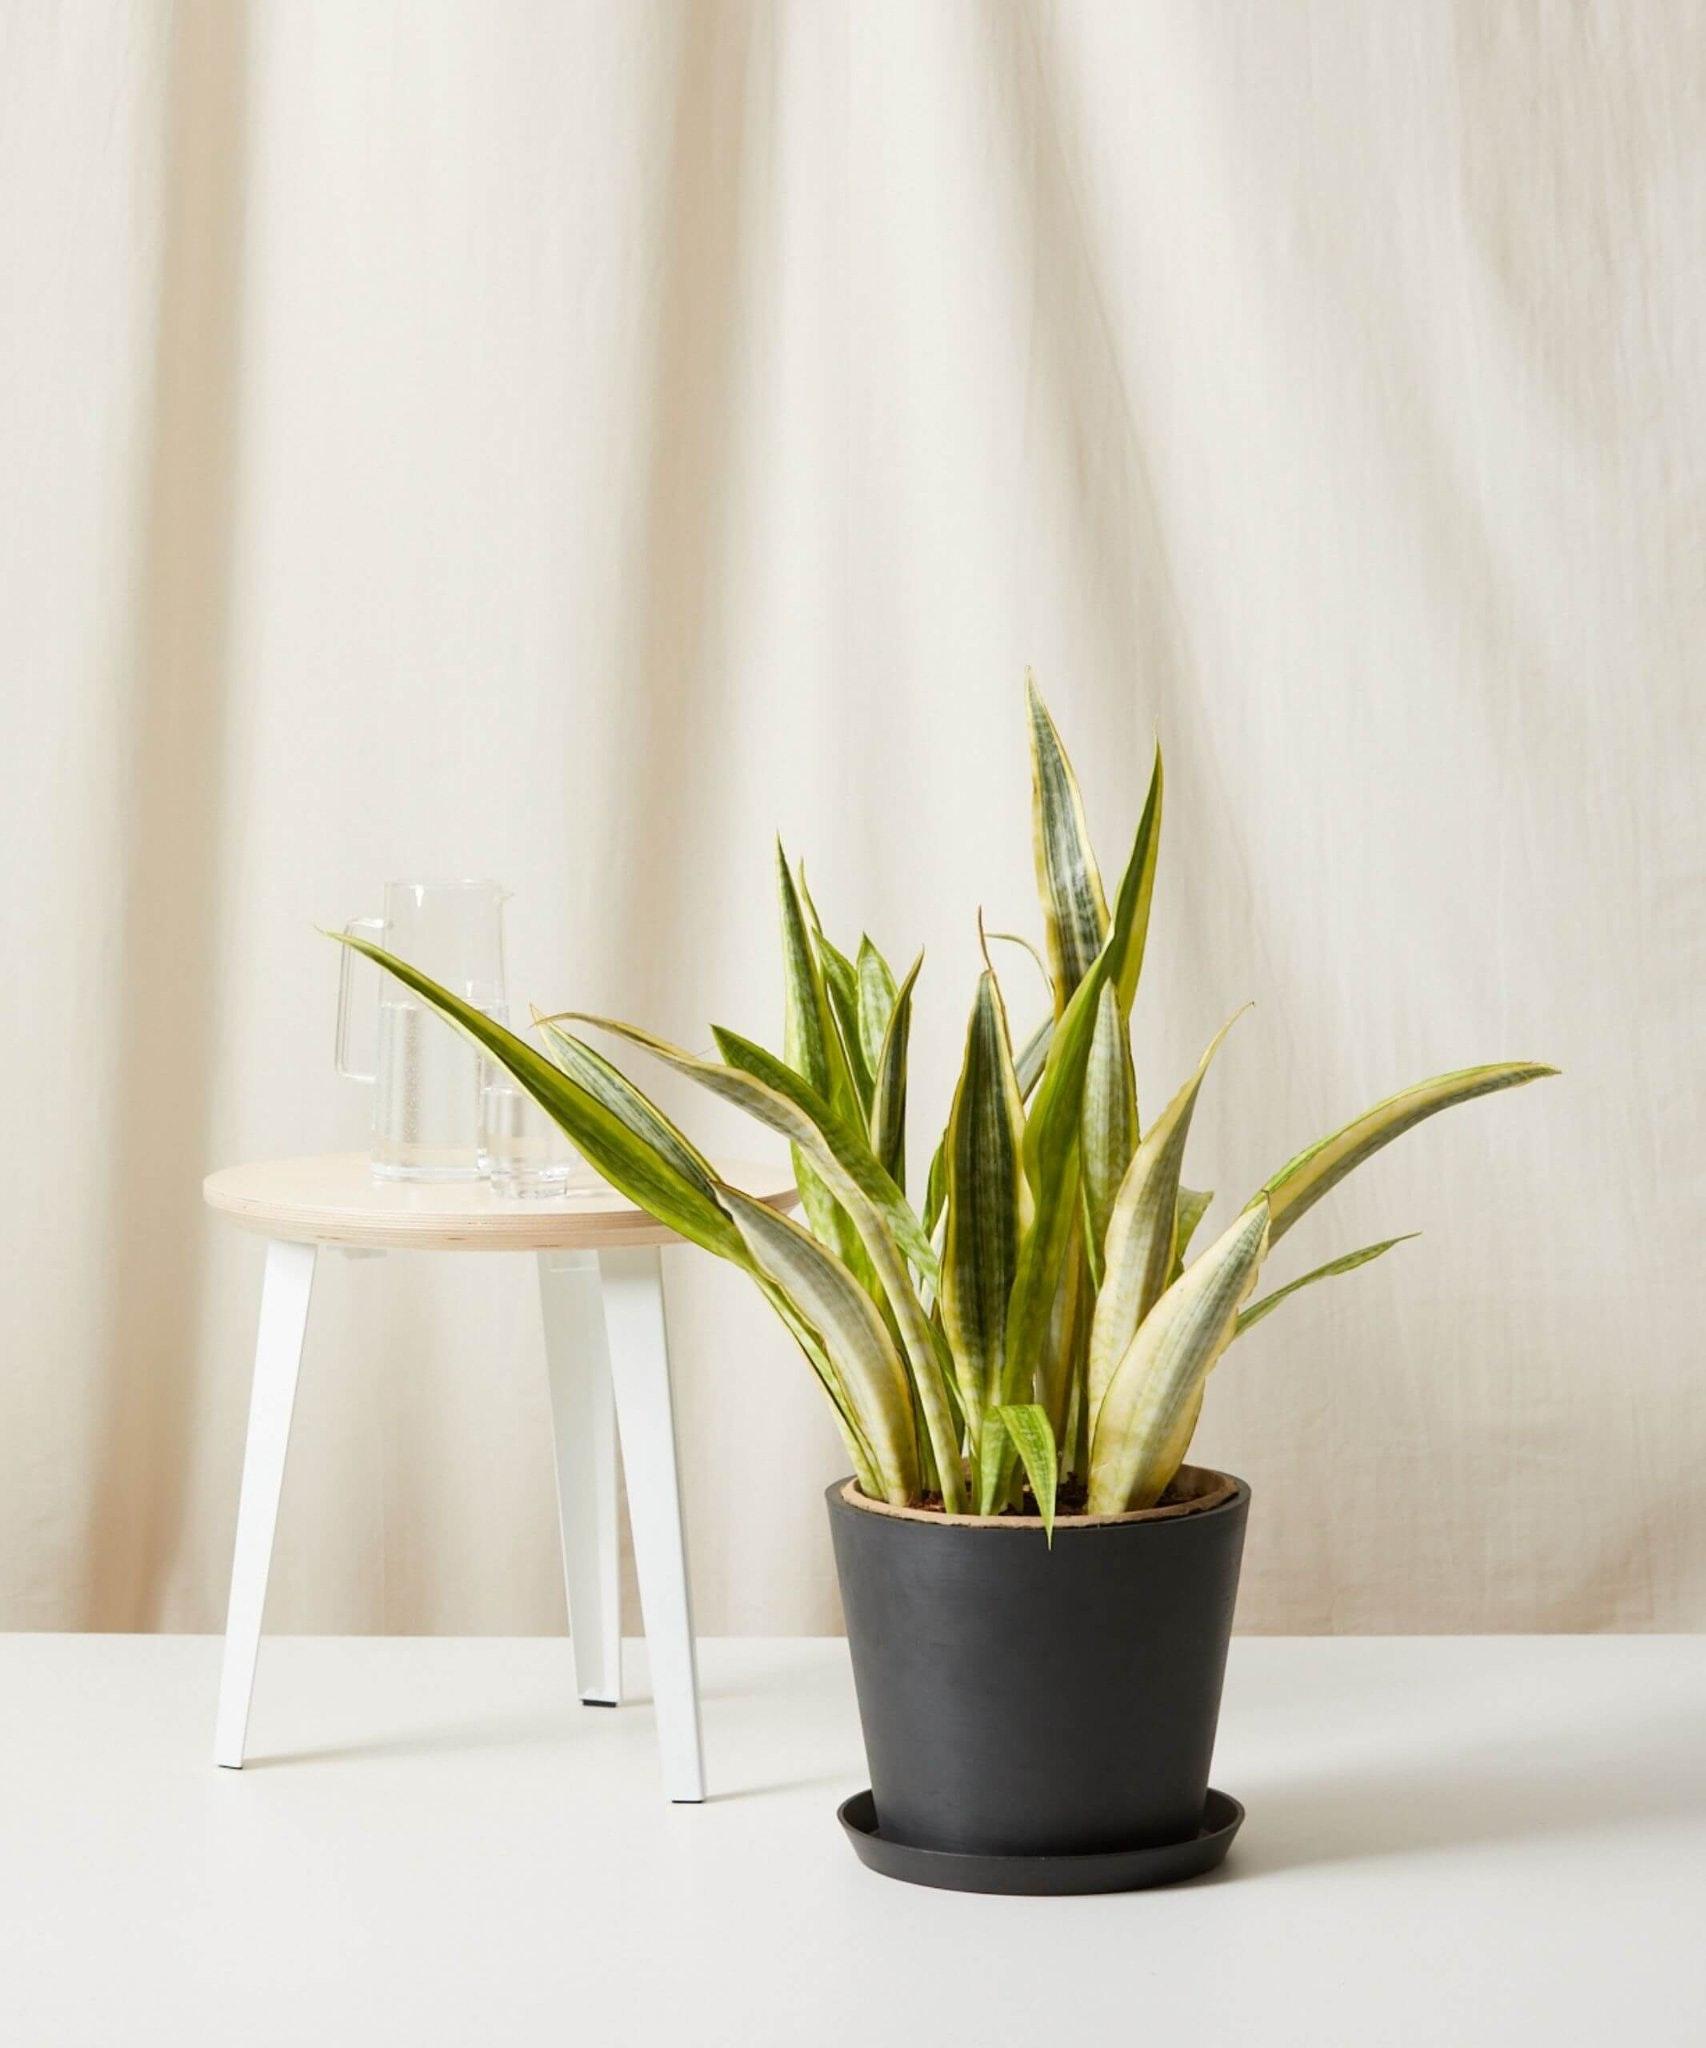 Sansevieria - Snake Plants